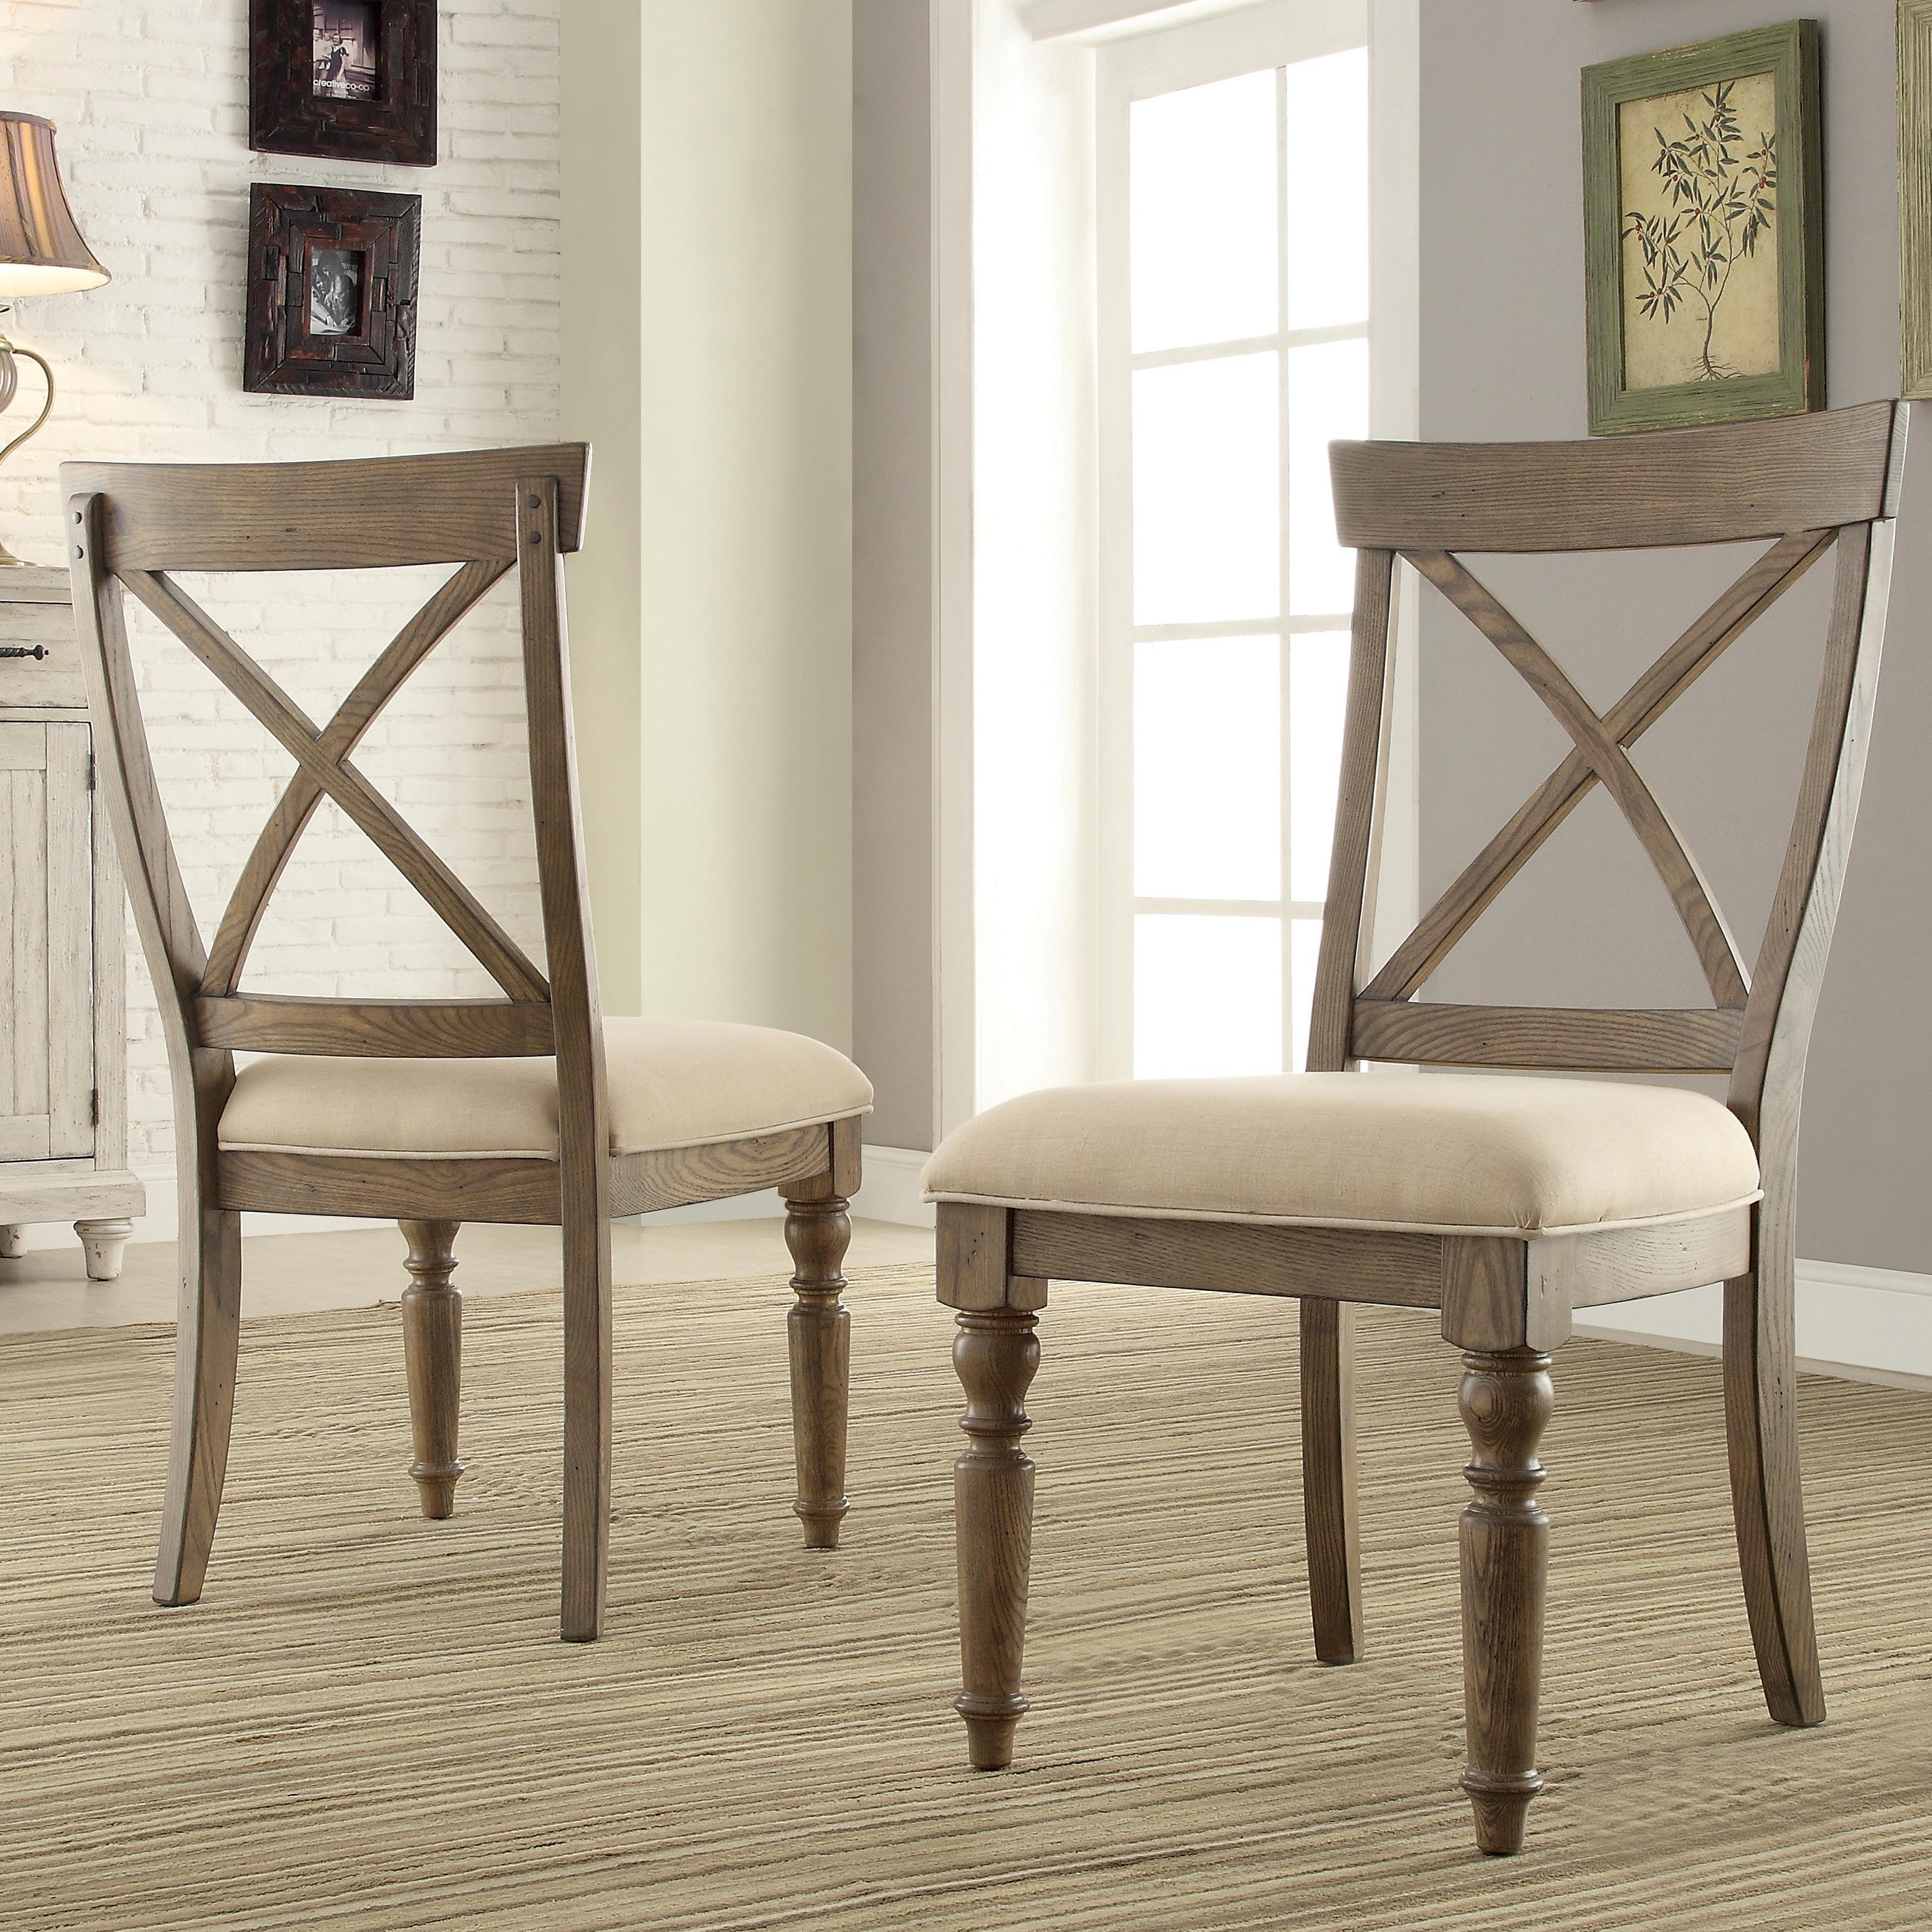 X Back Side Chair w Turned Legs by Riverside Furniture